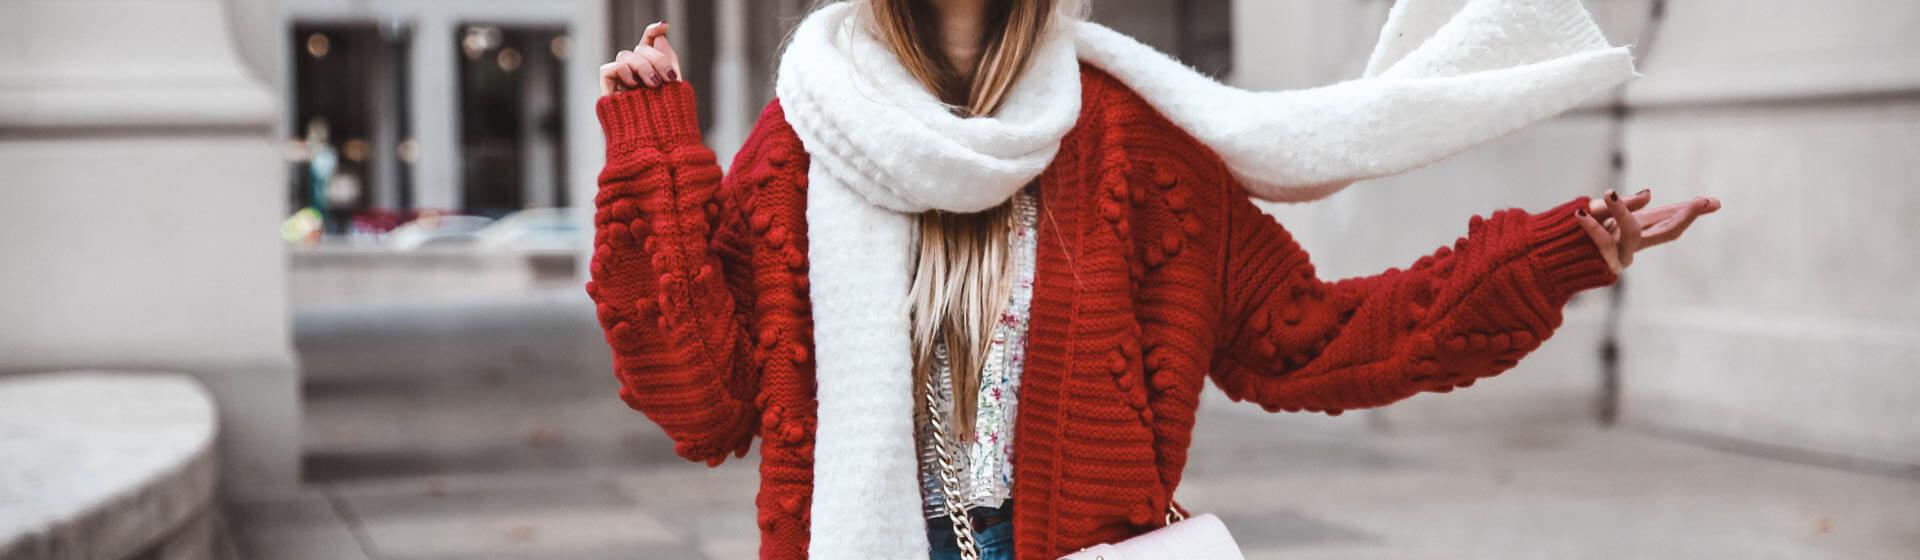 Trendfarbe Rot im Alltag kombinieren.